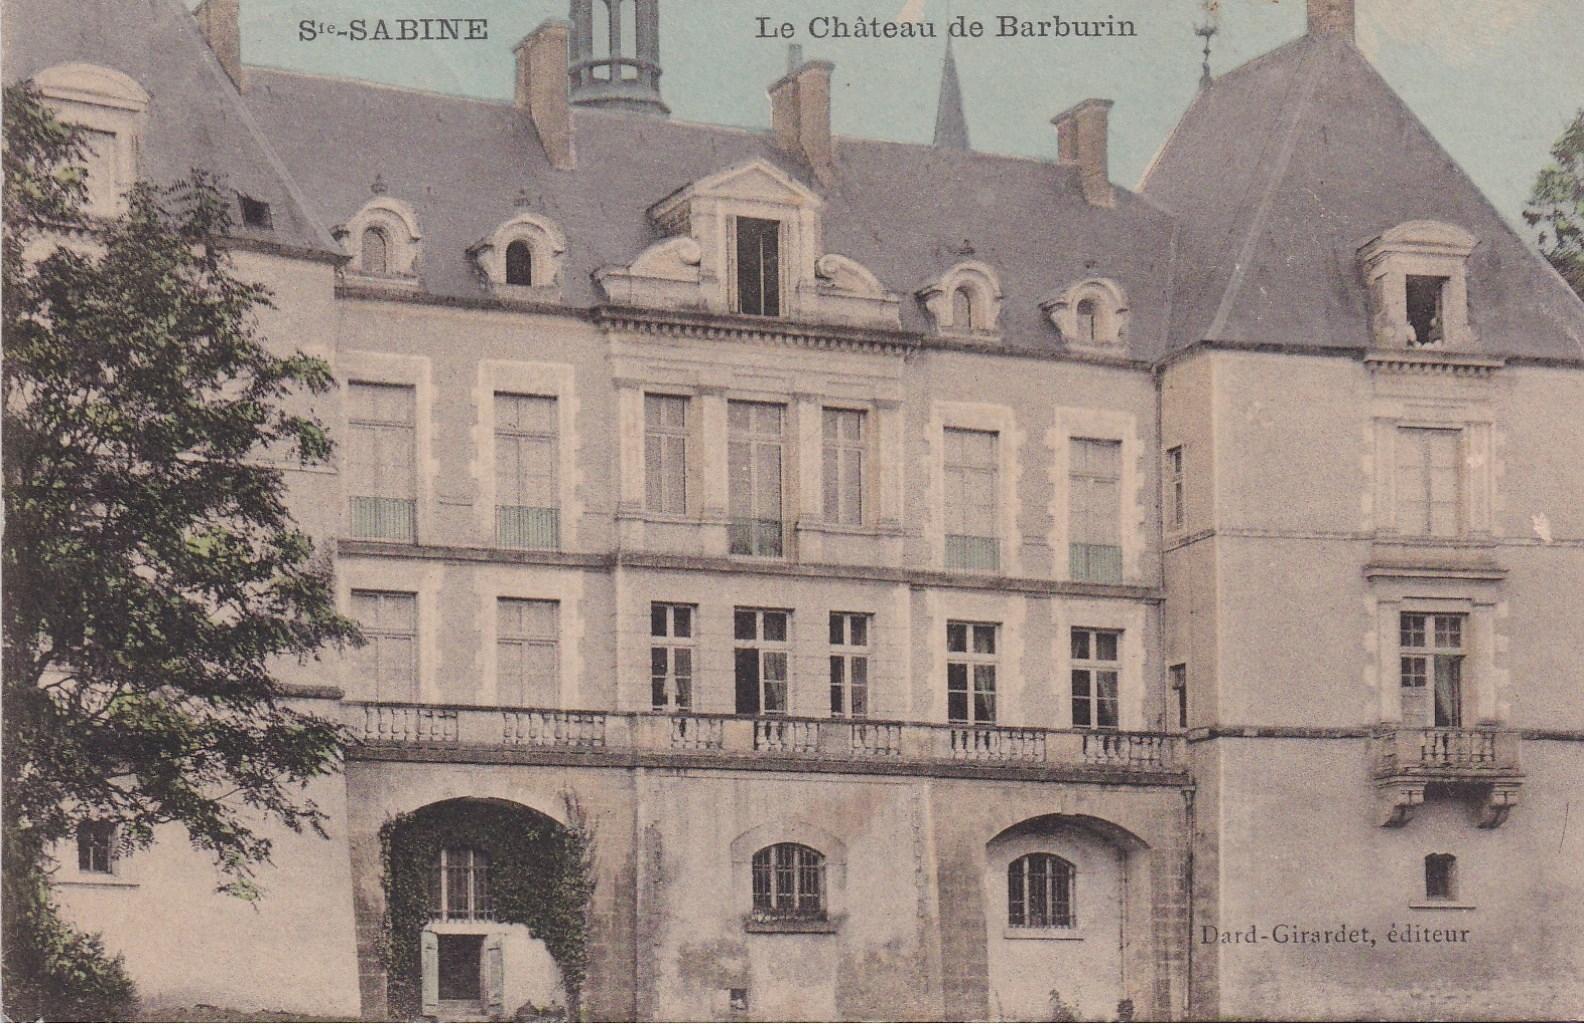 Sainte-Sabine